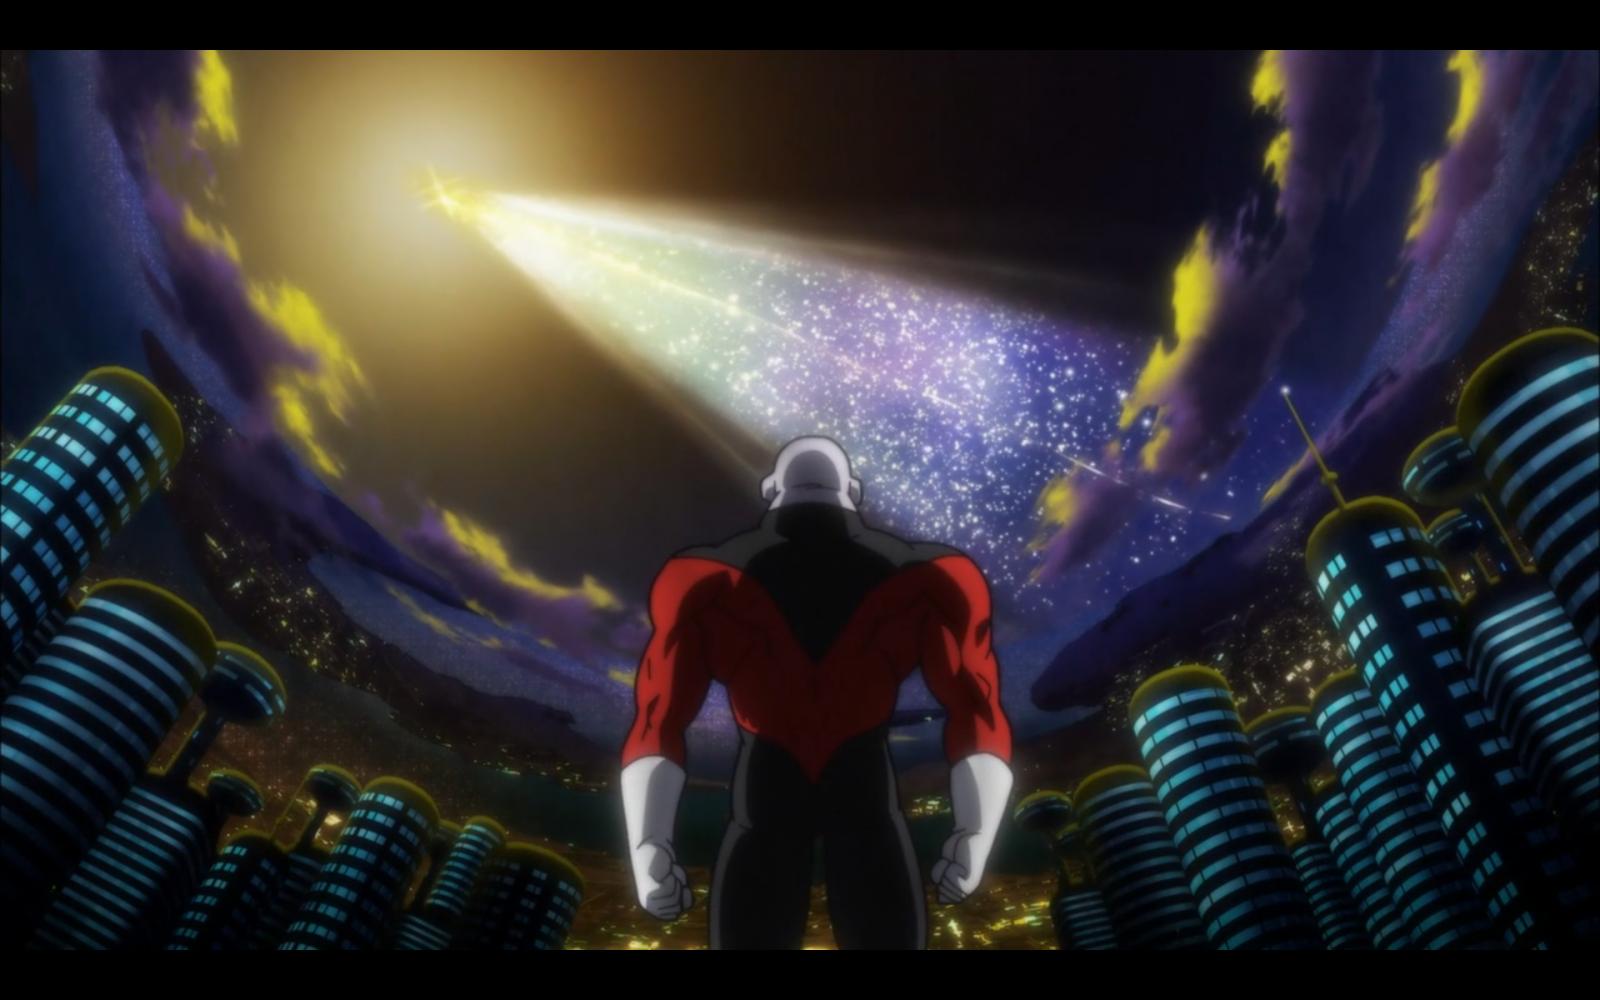 Wallpaper : Dragon Ball Super, jiren, anime, sky, stars ...